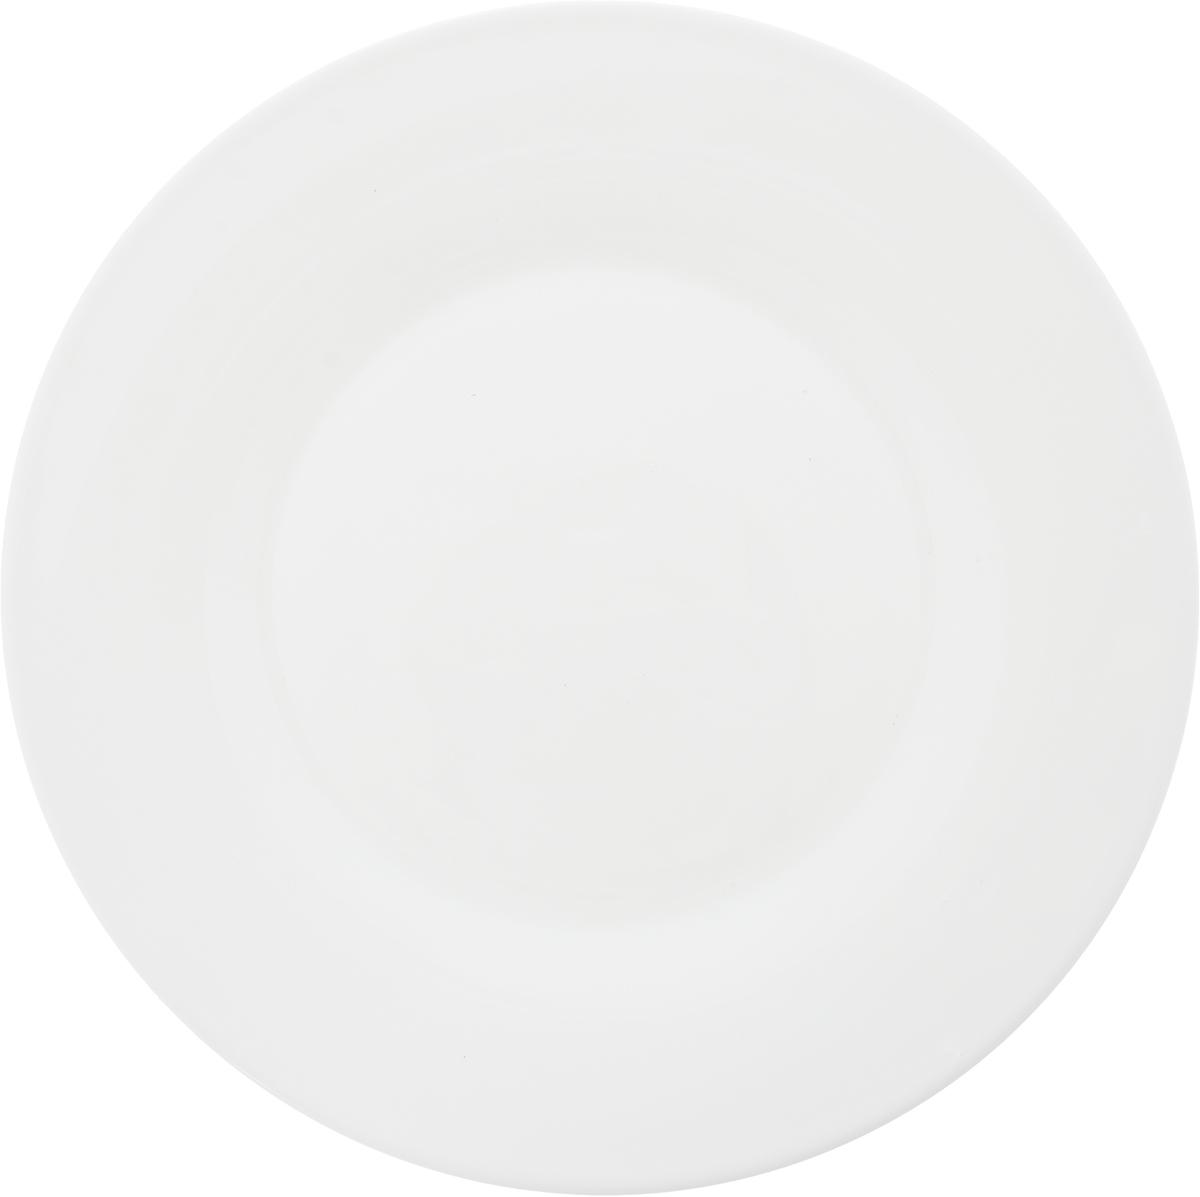 Тарелка обеденная Luminarc Alizee, диаметр 28 см тарелка десертная luminarcalizee диаметр 22 см